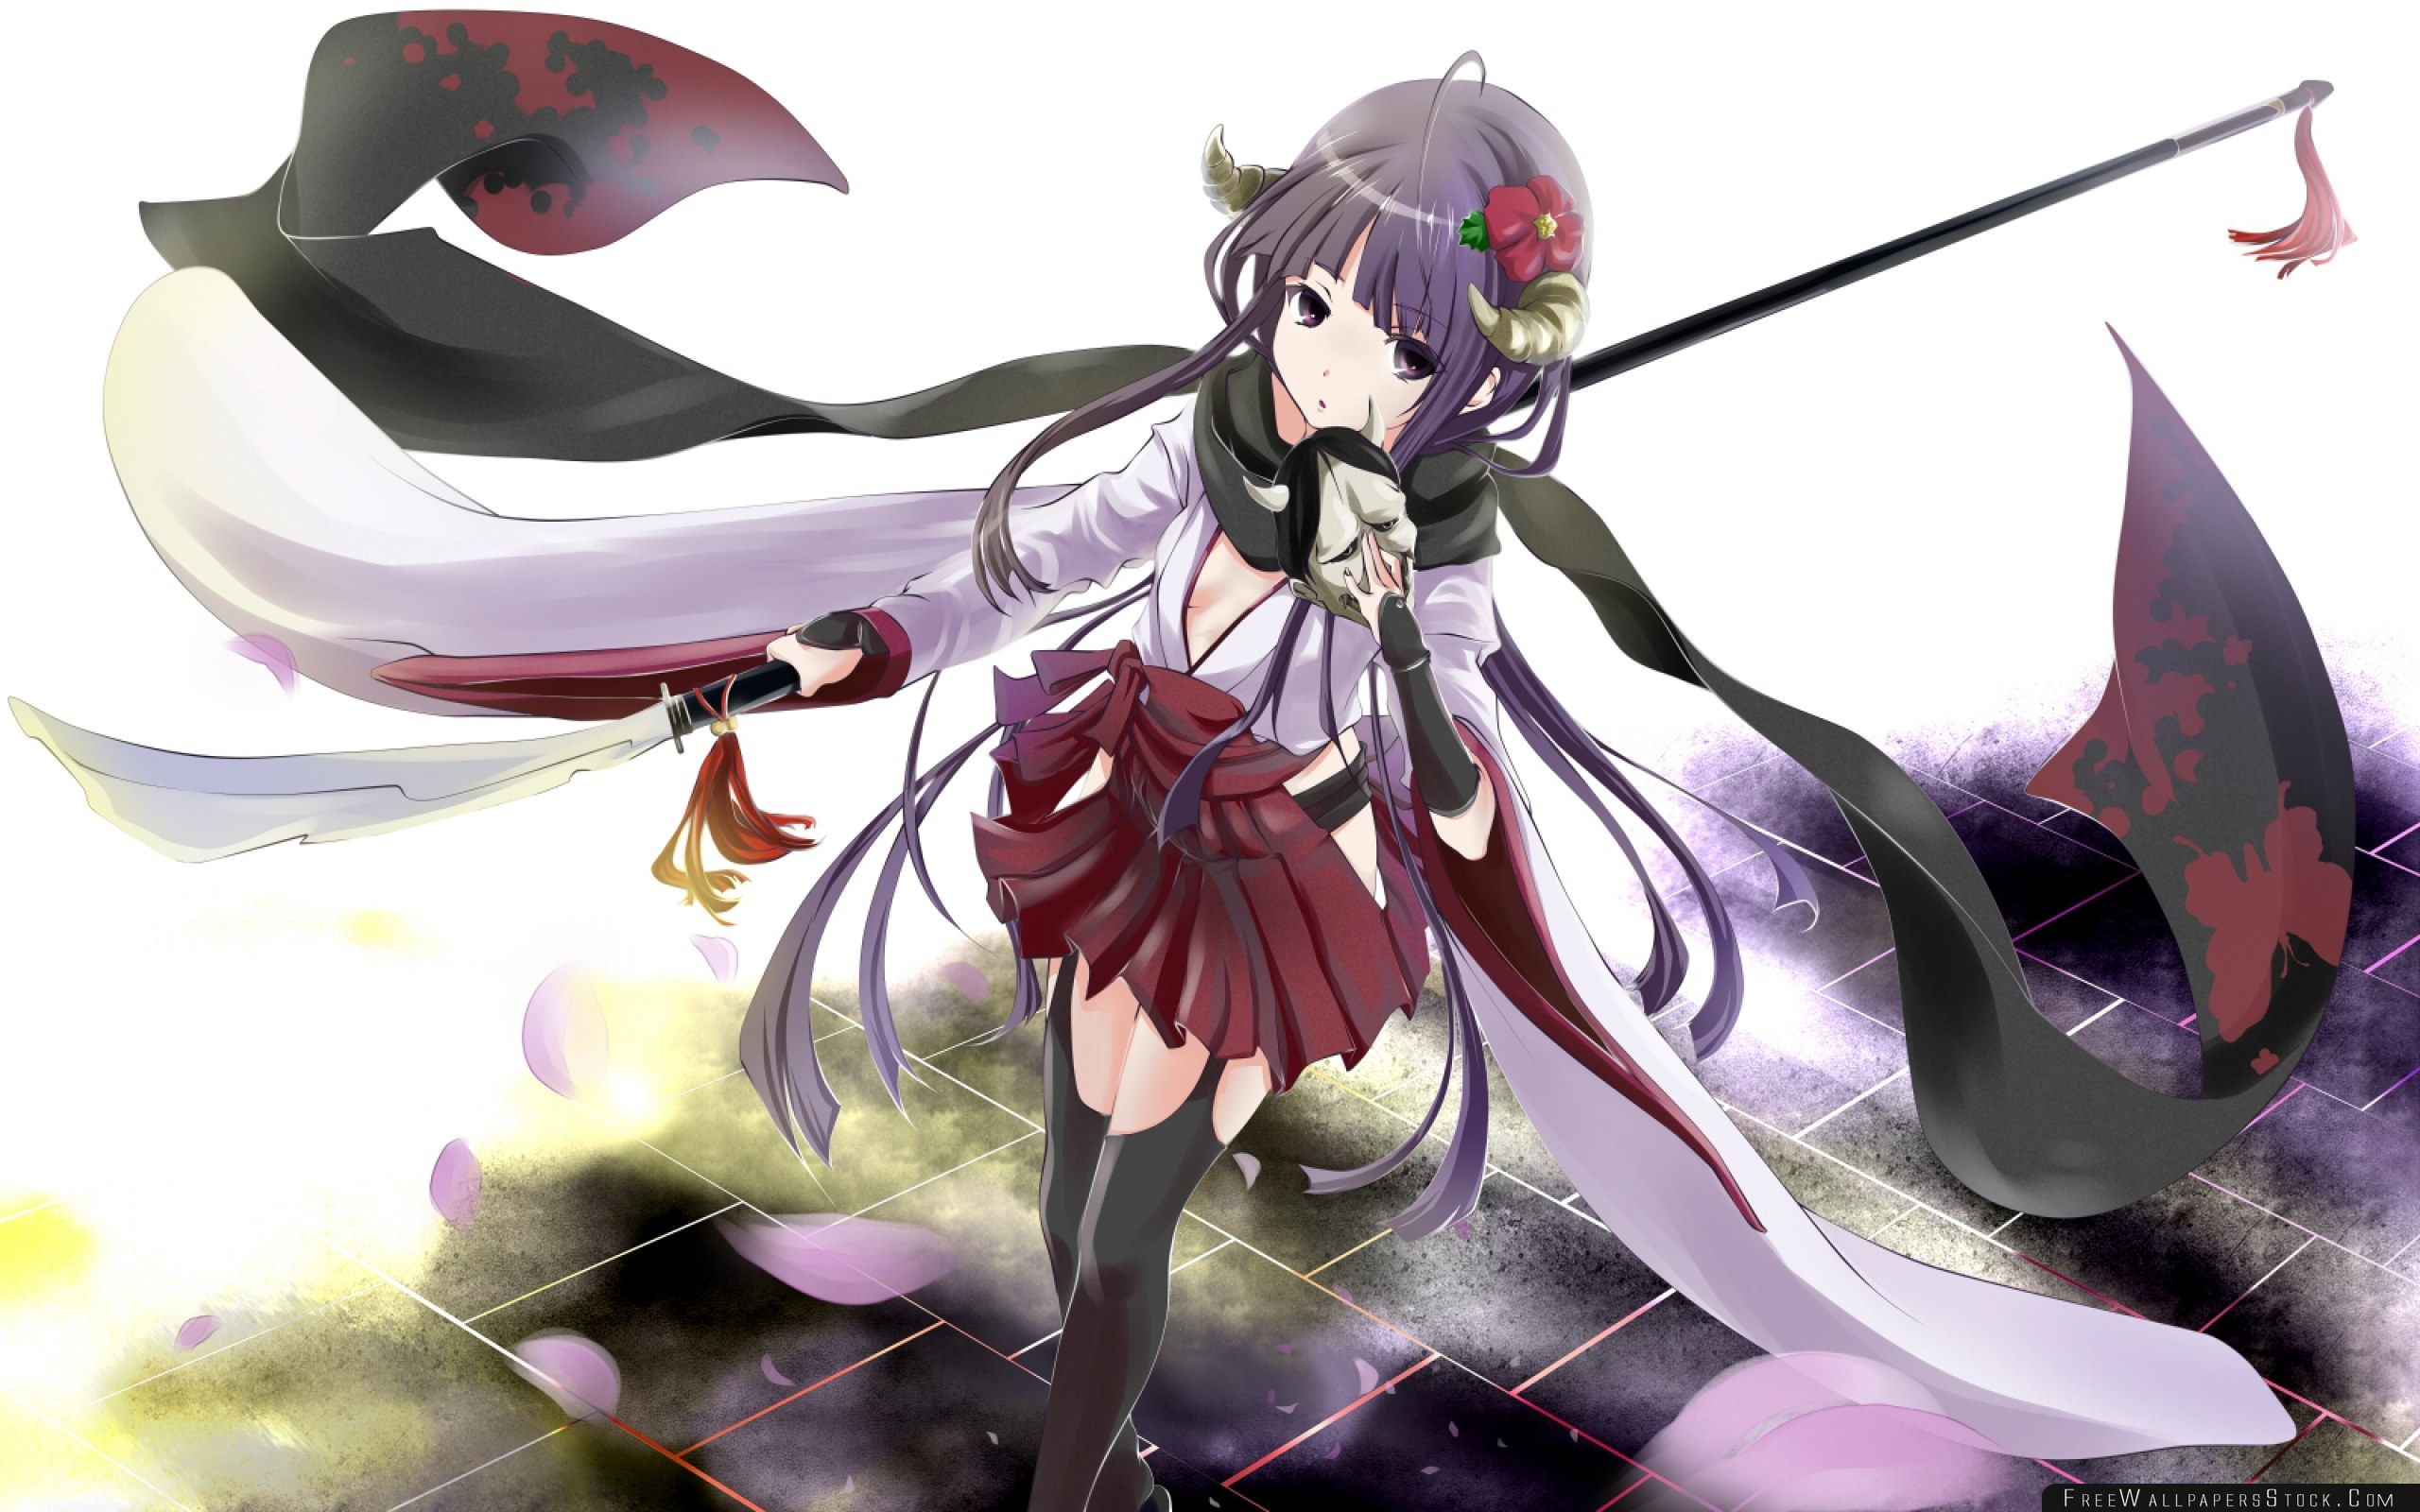 Download Free Wallpaper Anime Girl Brunette Scarf Step Wind